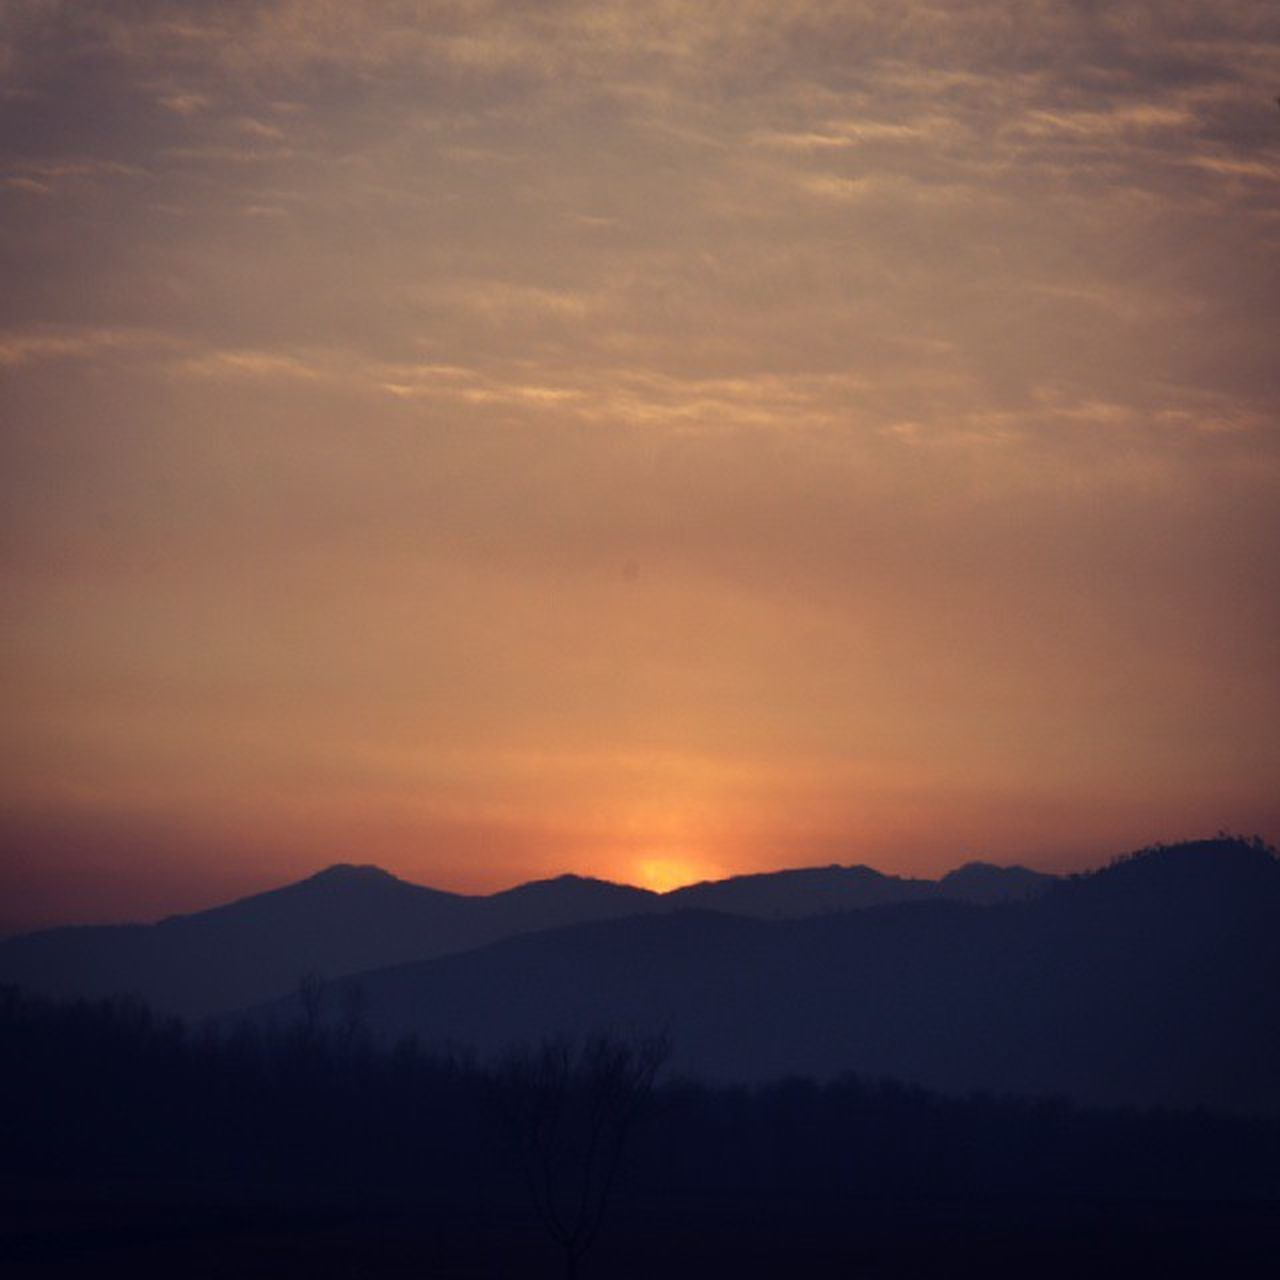 Sunset By The Lake Wular Lake Bandipur Watapora Nambel SopurBandipurRoad Revoshotsphotography Revoshots Revo Ilook Isee Iphotograph IExplore IExploreKashmir Kashmir Freedom Pakistan